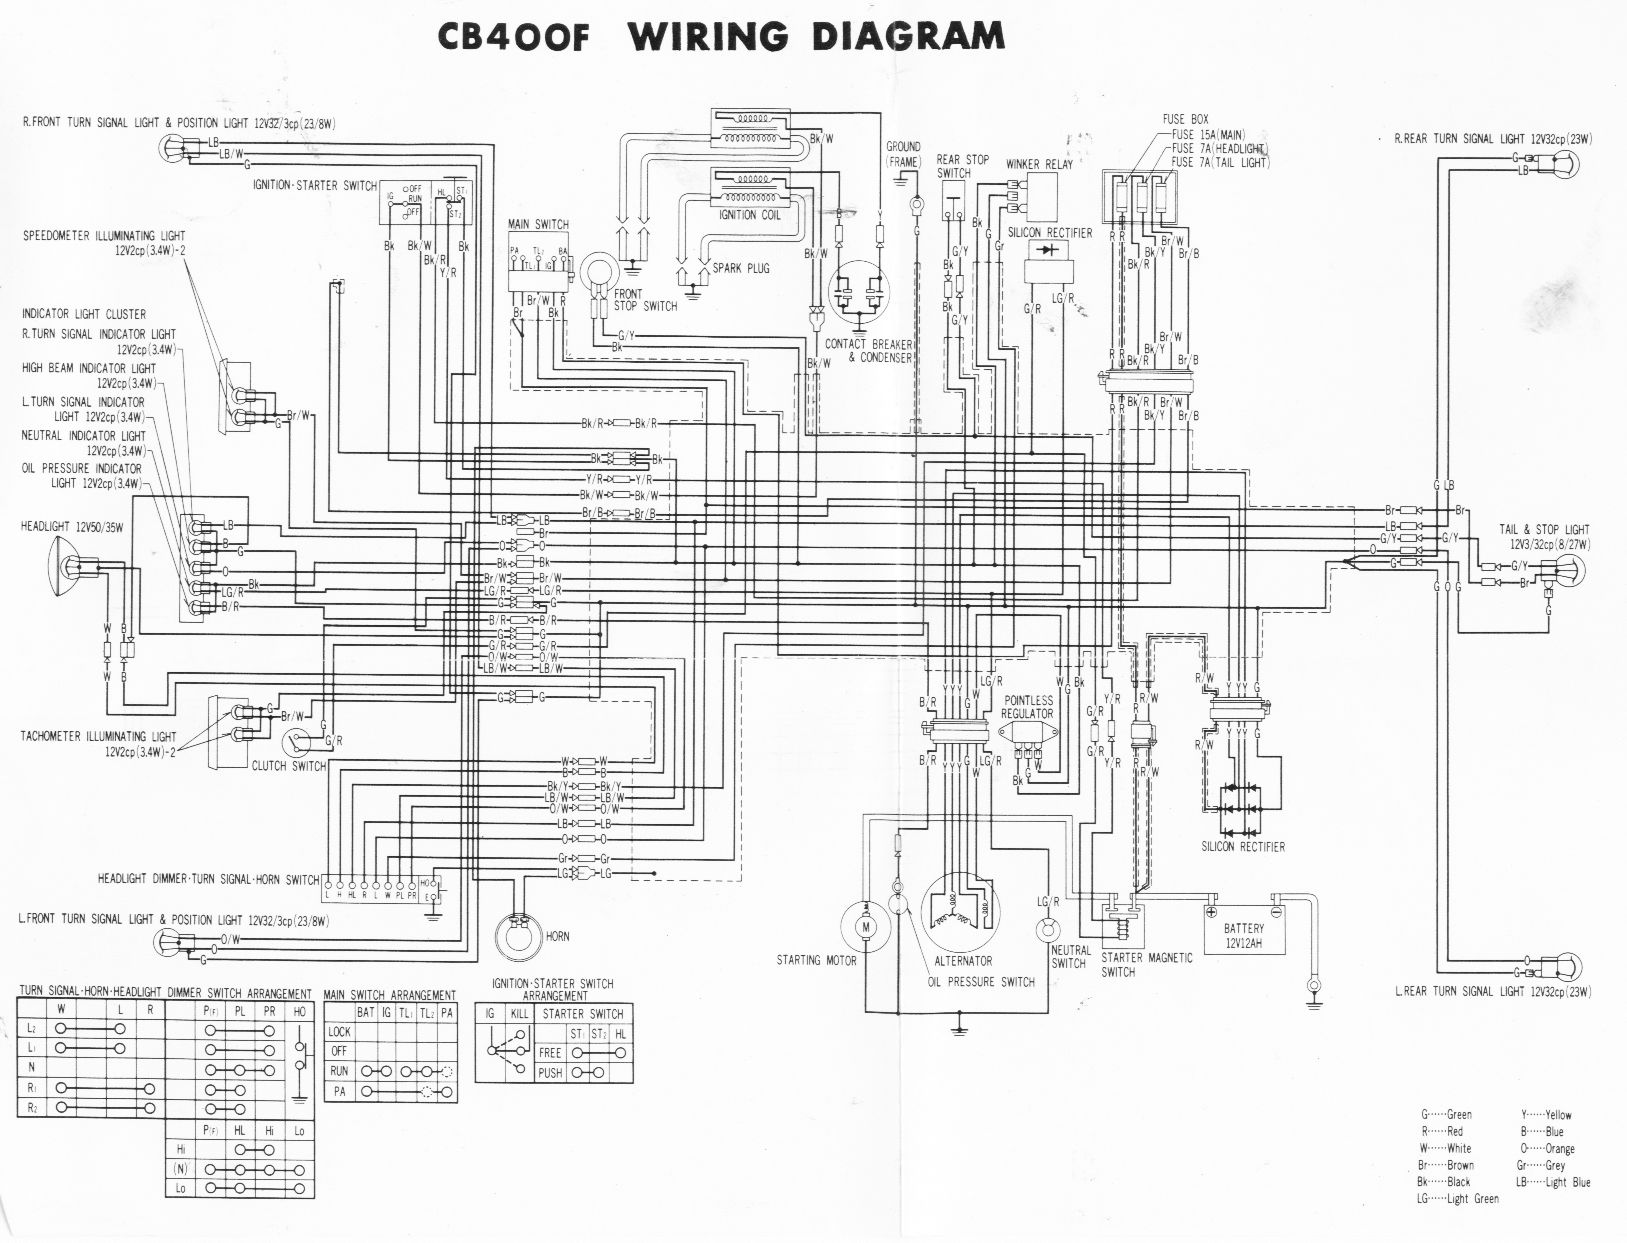 manual wiring diagram cb750f